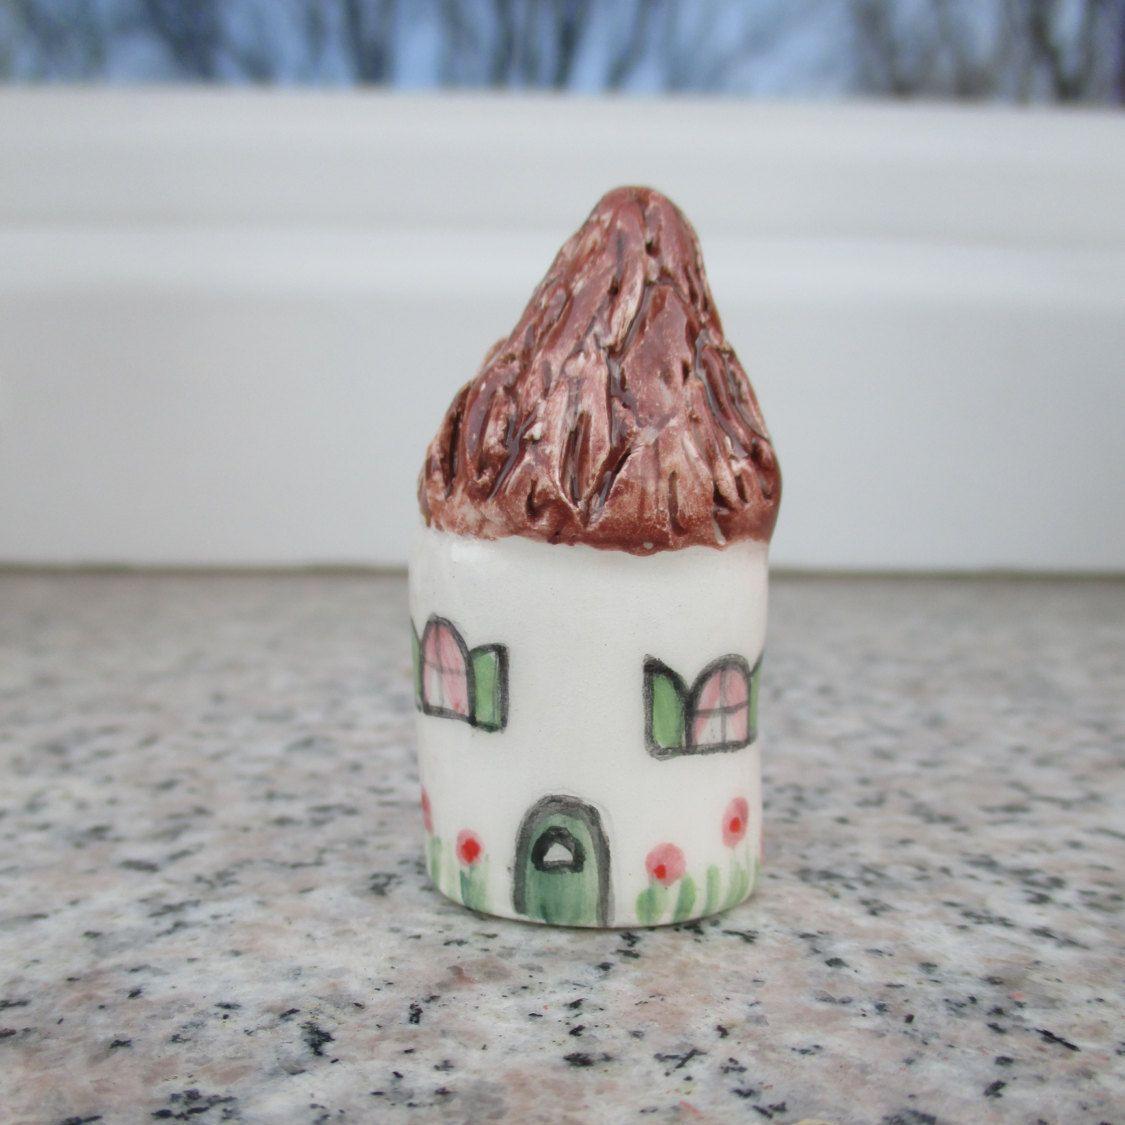 Miniature Ceramic Cottage,Small Ceramic cottage,Tiny Pottery House,Thatched Roof,Miniature House,Terrarium House,Pottery,Cottage,Small House by TatjanaCeramics on Etsy